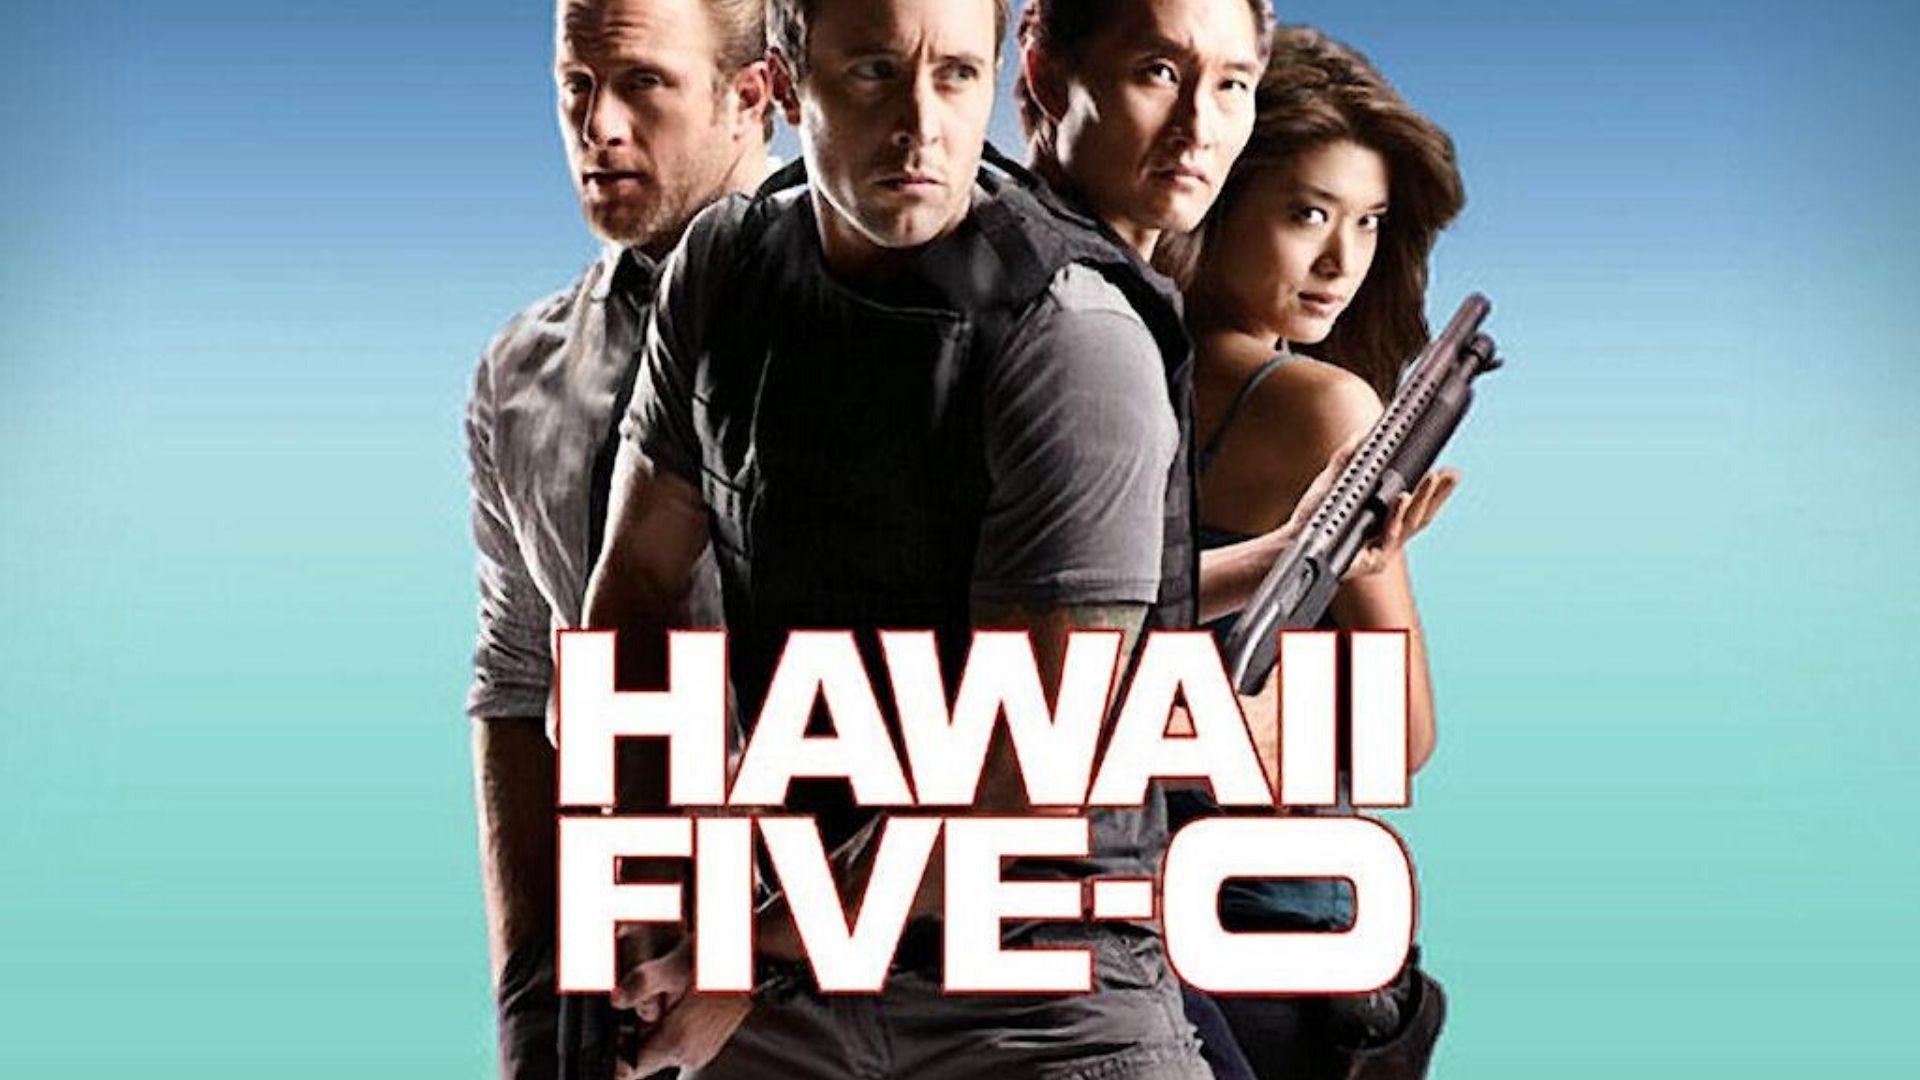 Hawaii 5-0: Season 10 Will Be The Last On CBS